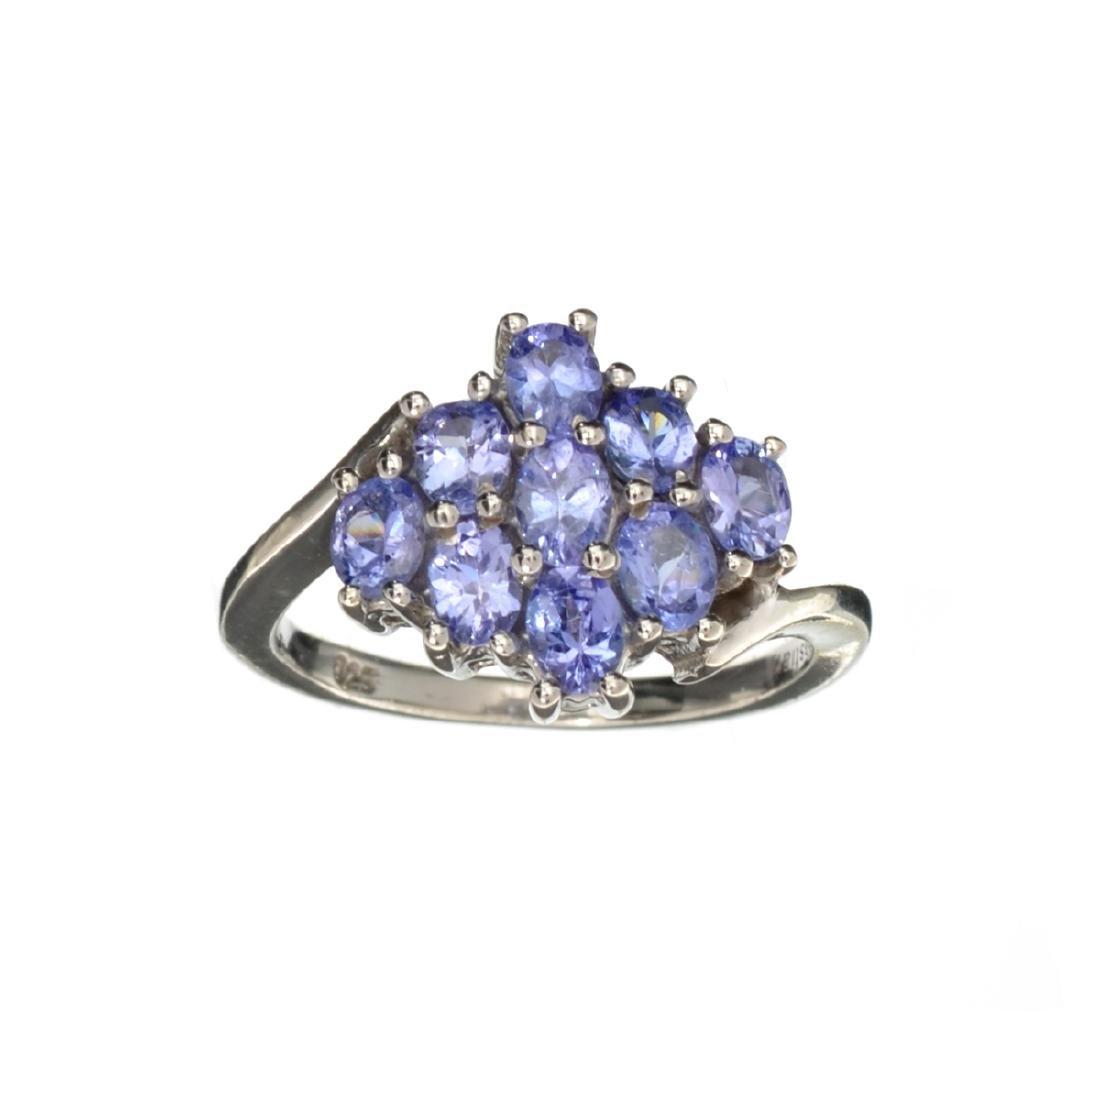 APP: 1.4k Fine Jewelry 1.50CT Oval Cut Tanzanite And